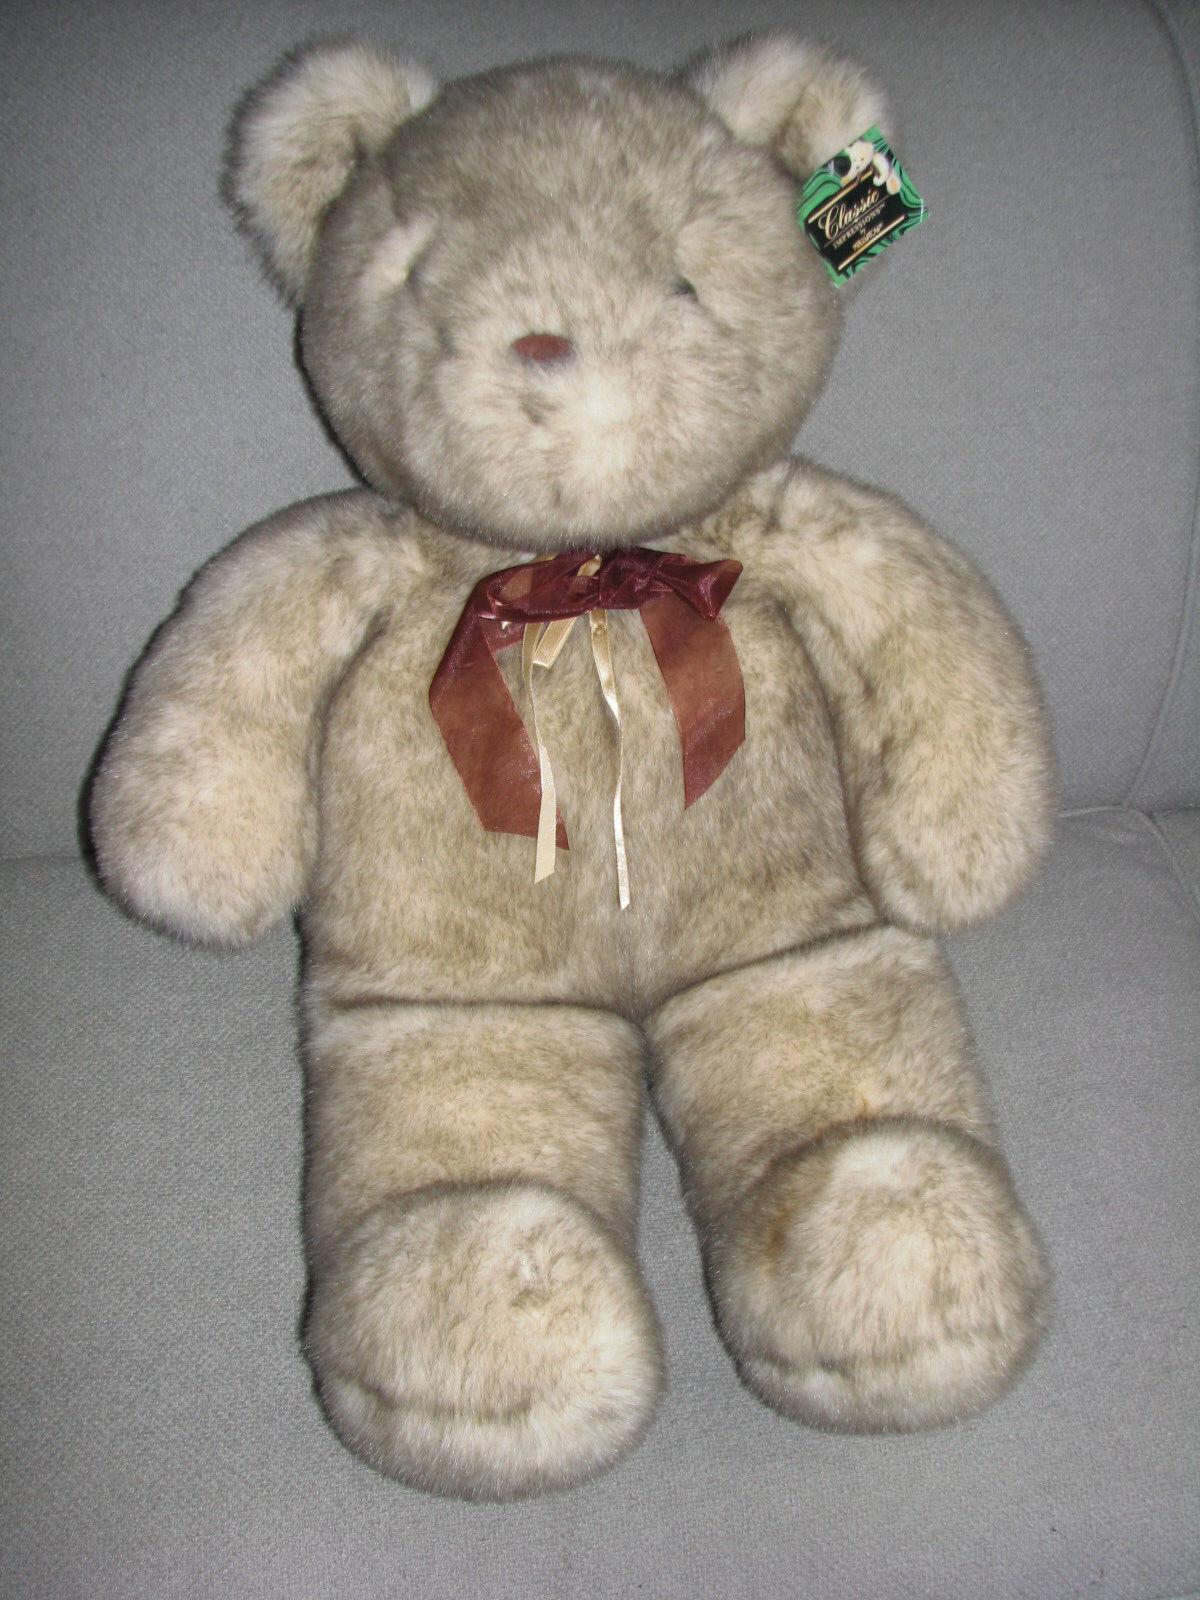 KELLYTOY KELLY TOY CLASSIC IMPRESSIONS BIG HUGE LARGE STUFFED PLUSH TEDDY BEAR